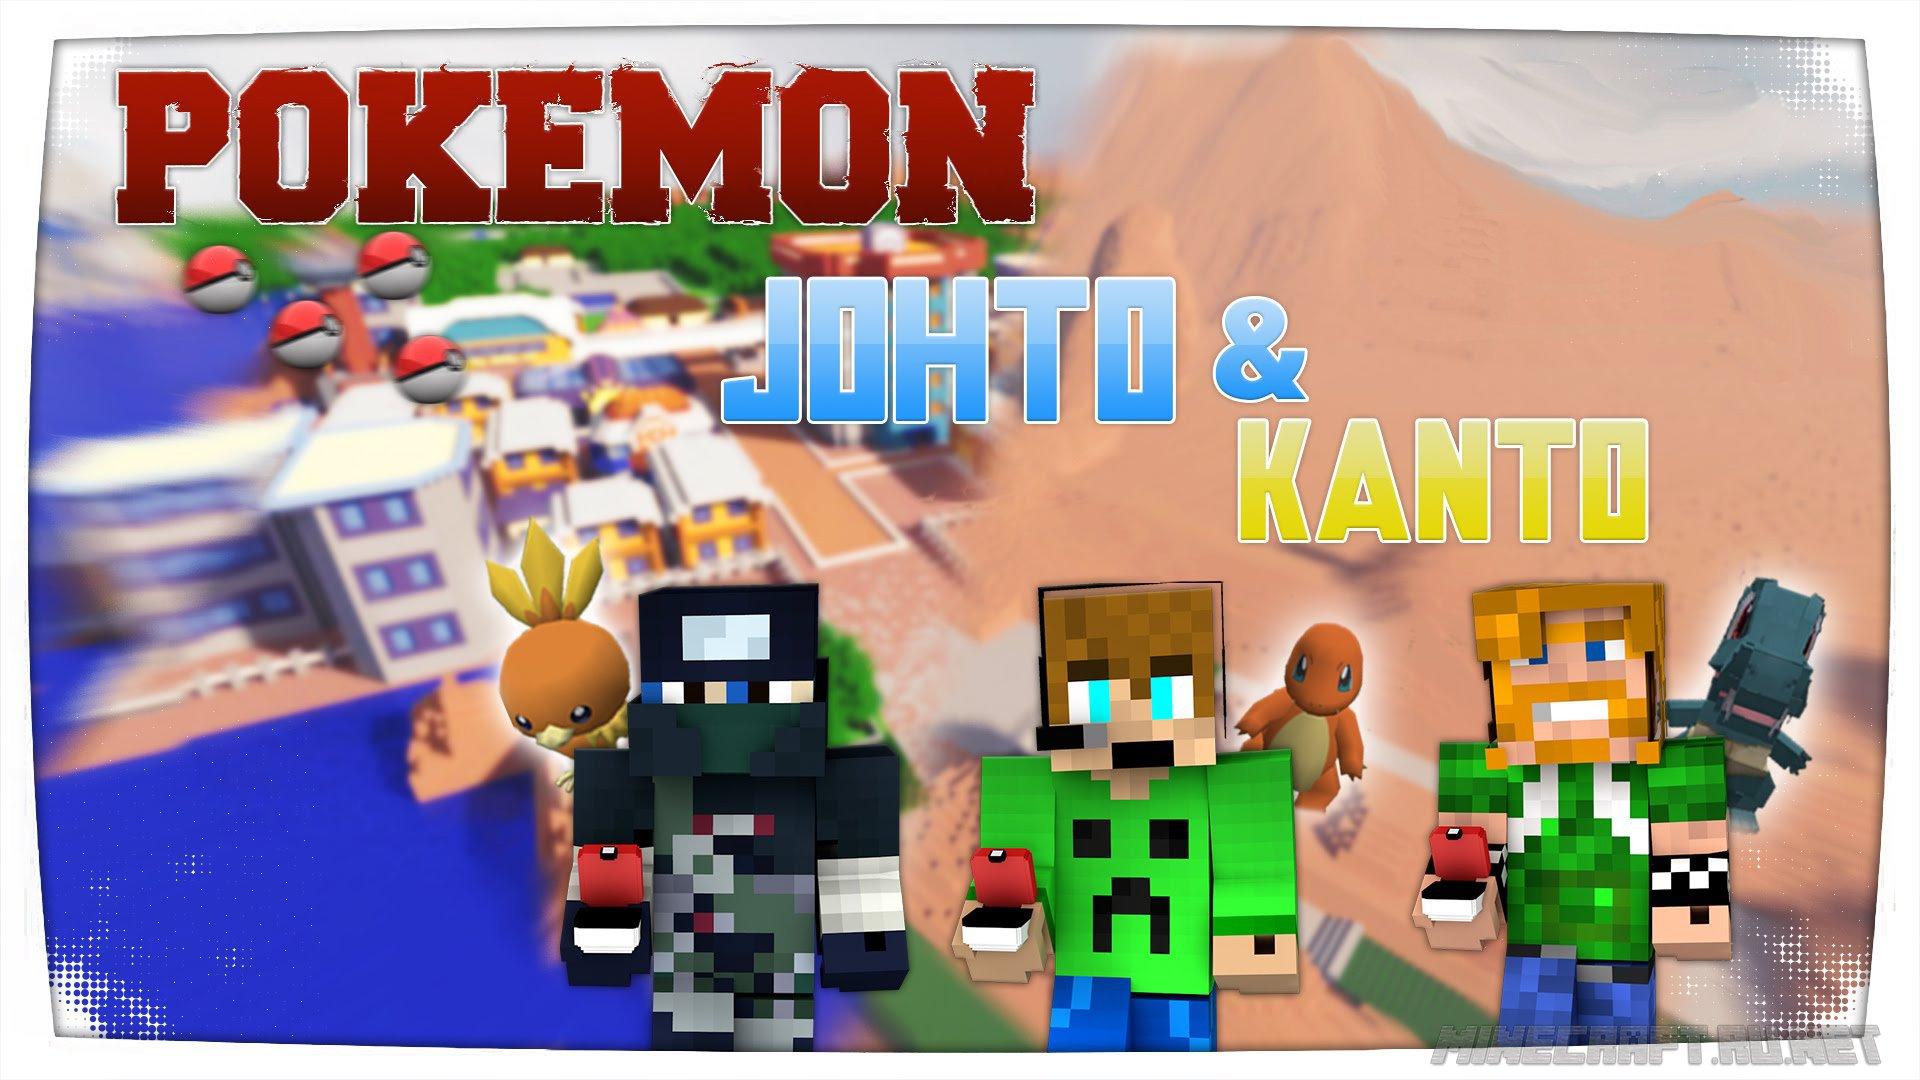 Minecraft Pokemon Johto & Kanto